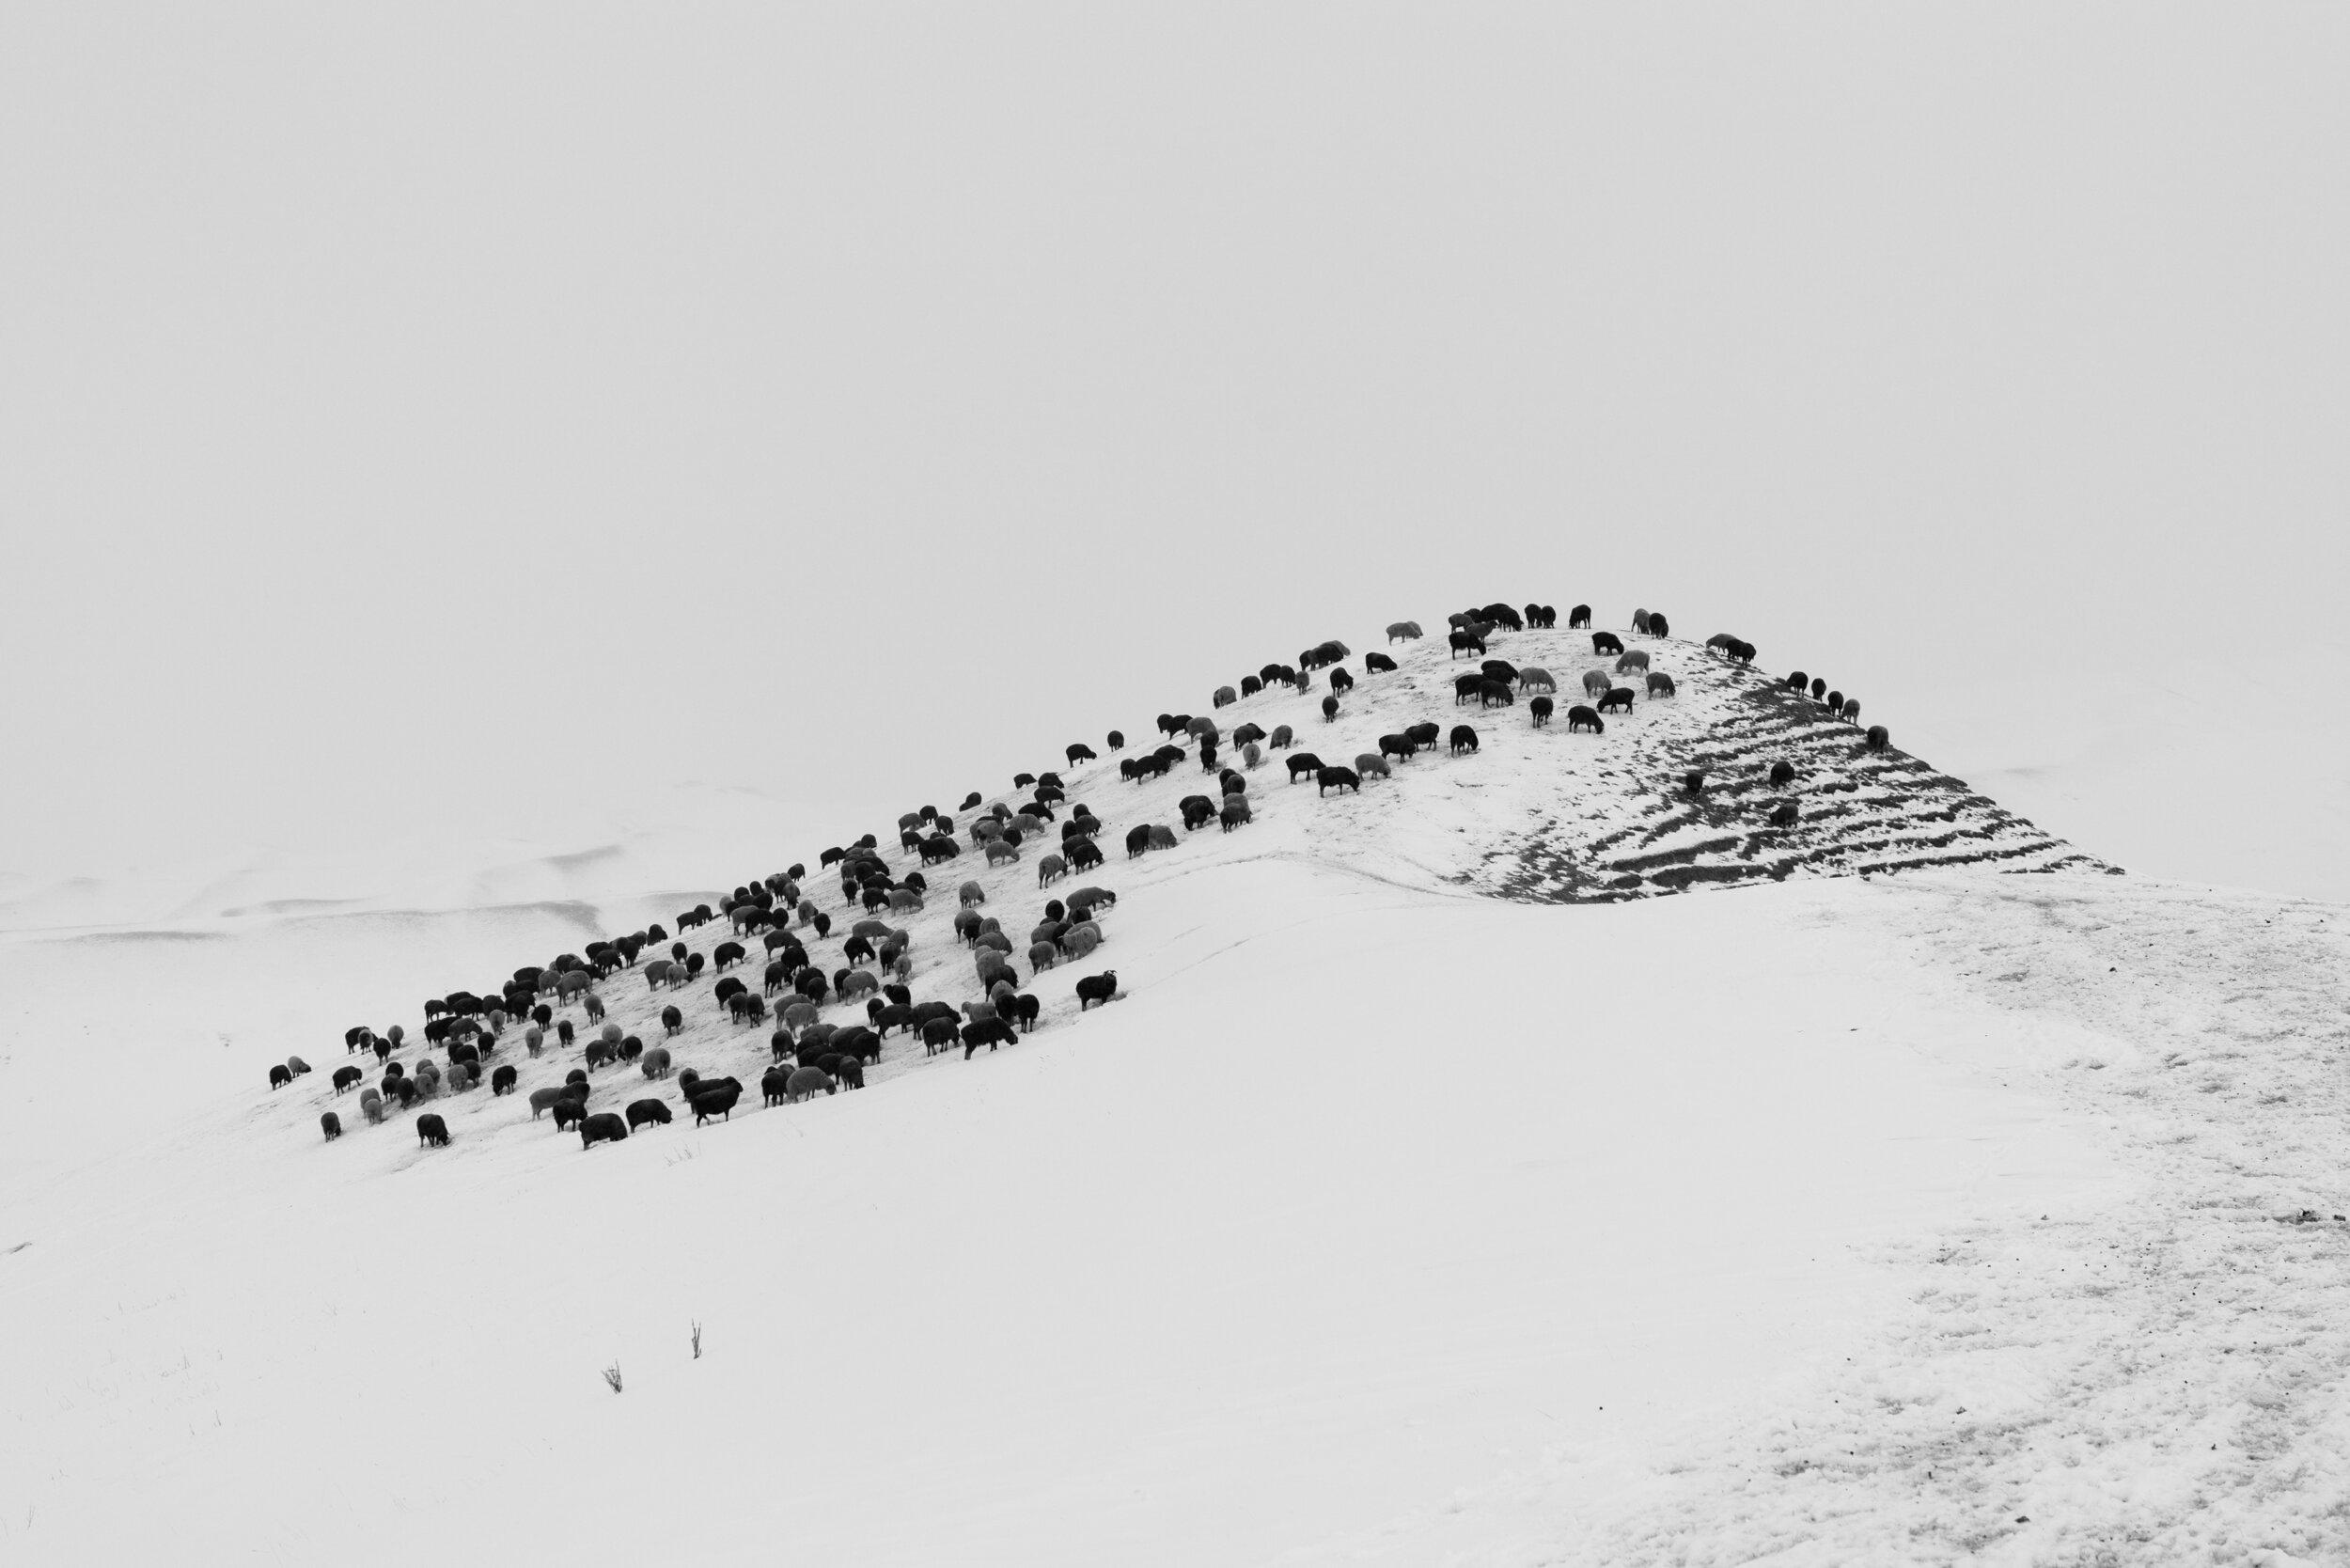 Horse Head #18 - Foto geprint op Fine Art Pearl Baryta (Satin) 285gsm Papier - 40 x 60 cm - 60 x 90 cm - 90 x 135 cm - 135 x 195 cm